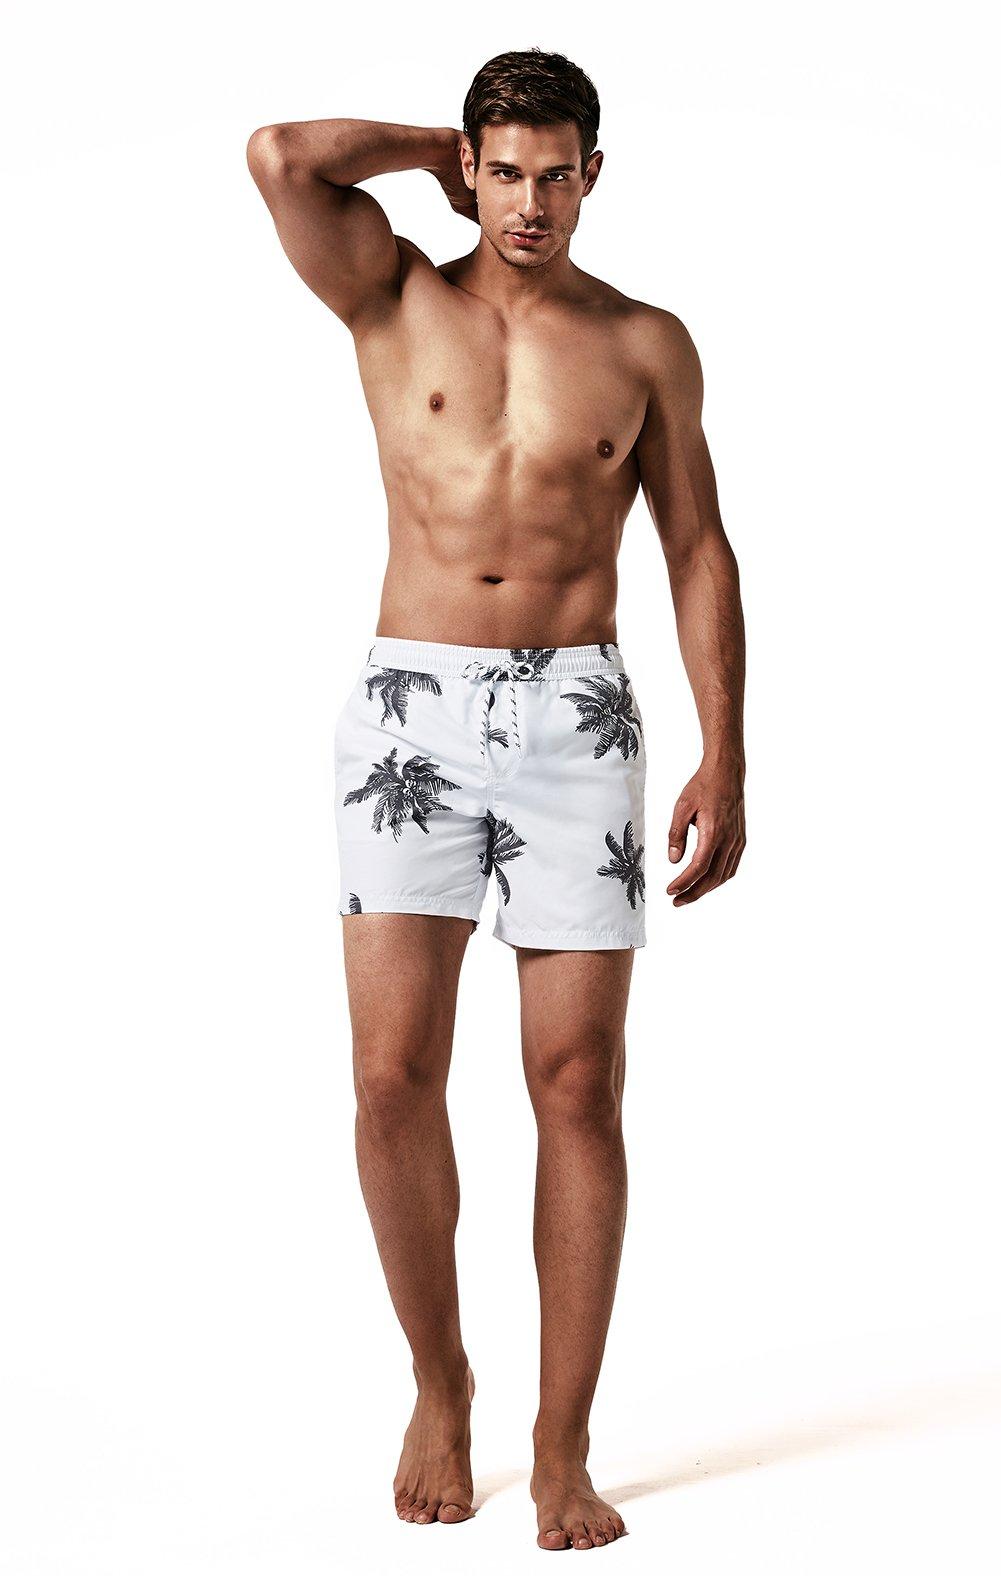 MaaMgic Uomo Costume da Bagno Nuoto Calzoncini Asciugatura Veloce per Spiaggia Mare Piscina 9 spesavip